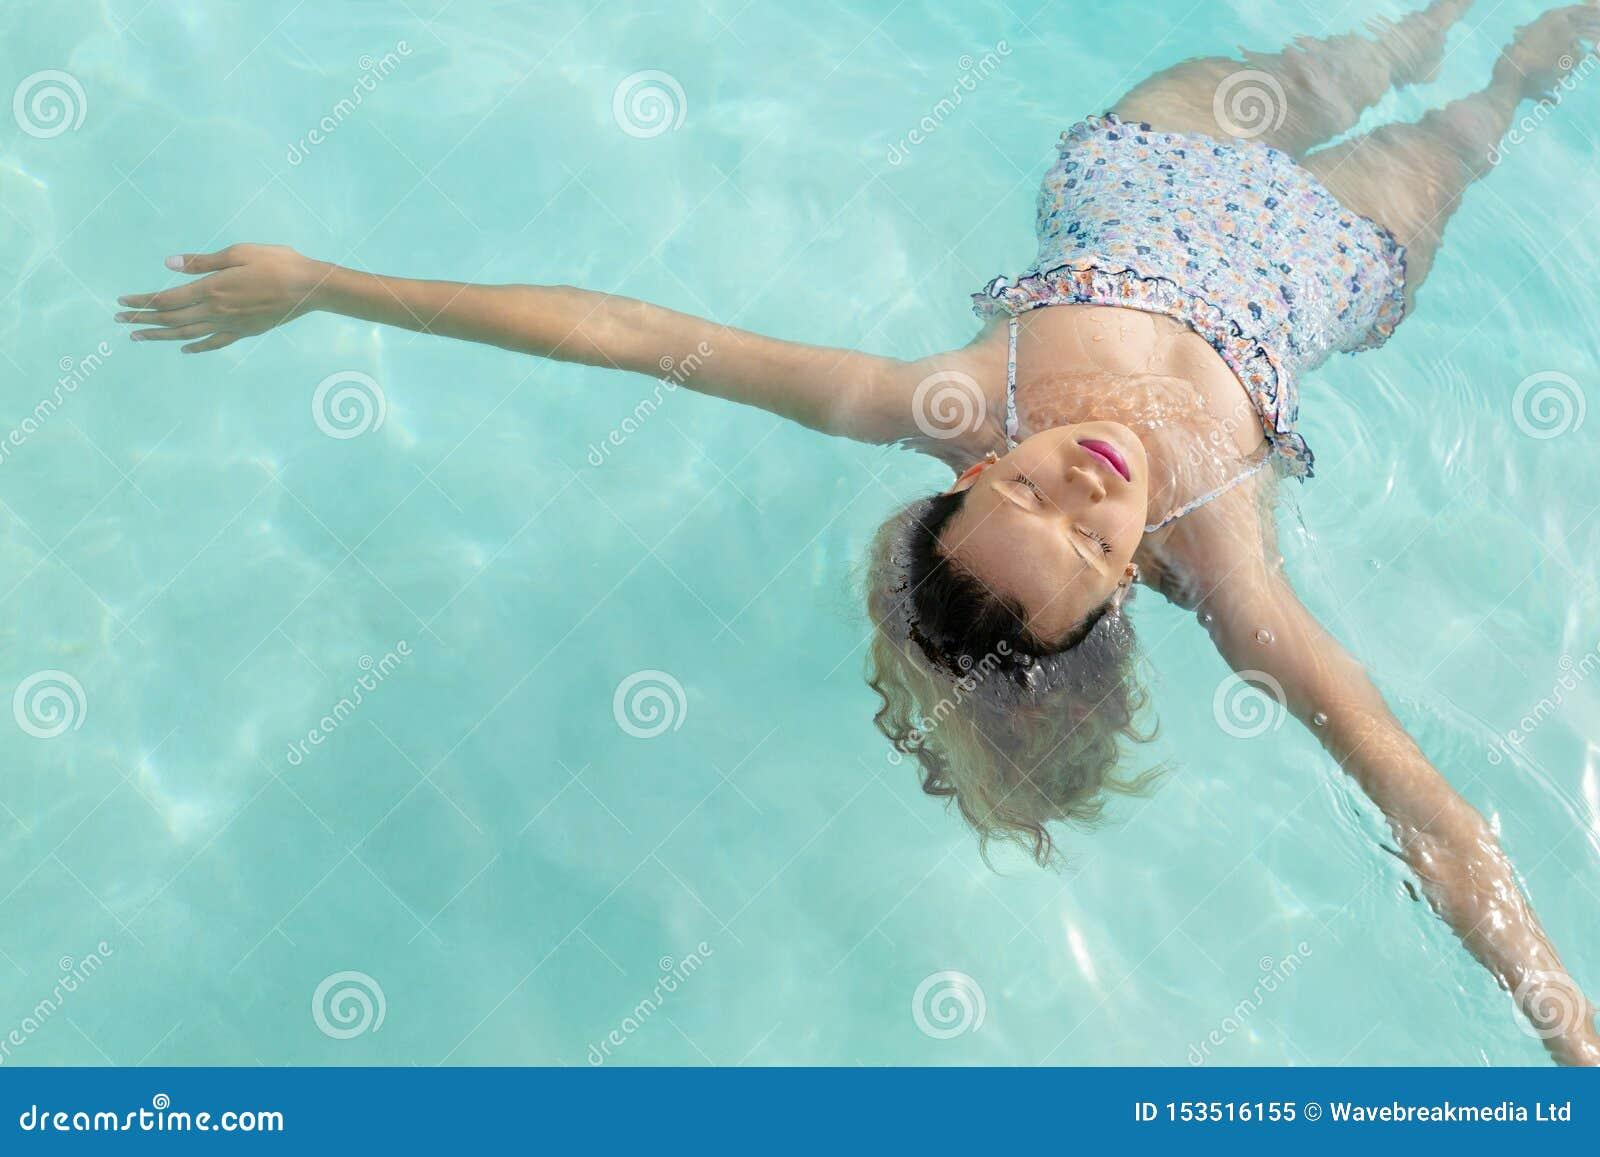 woman eyes closed floating swimming pool backyard home high ange view beautiful caucasian summer fun